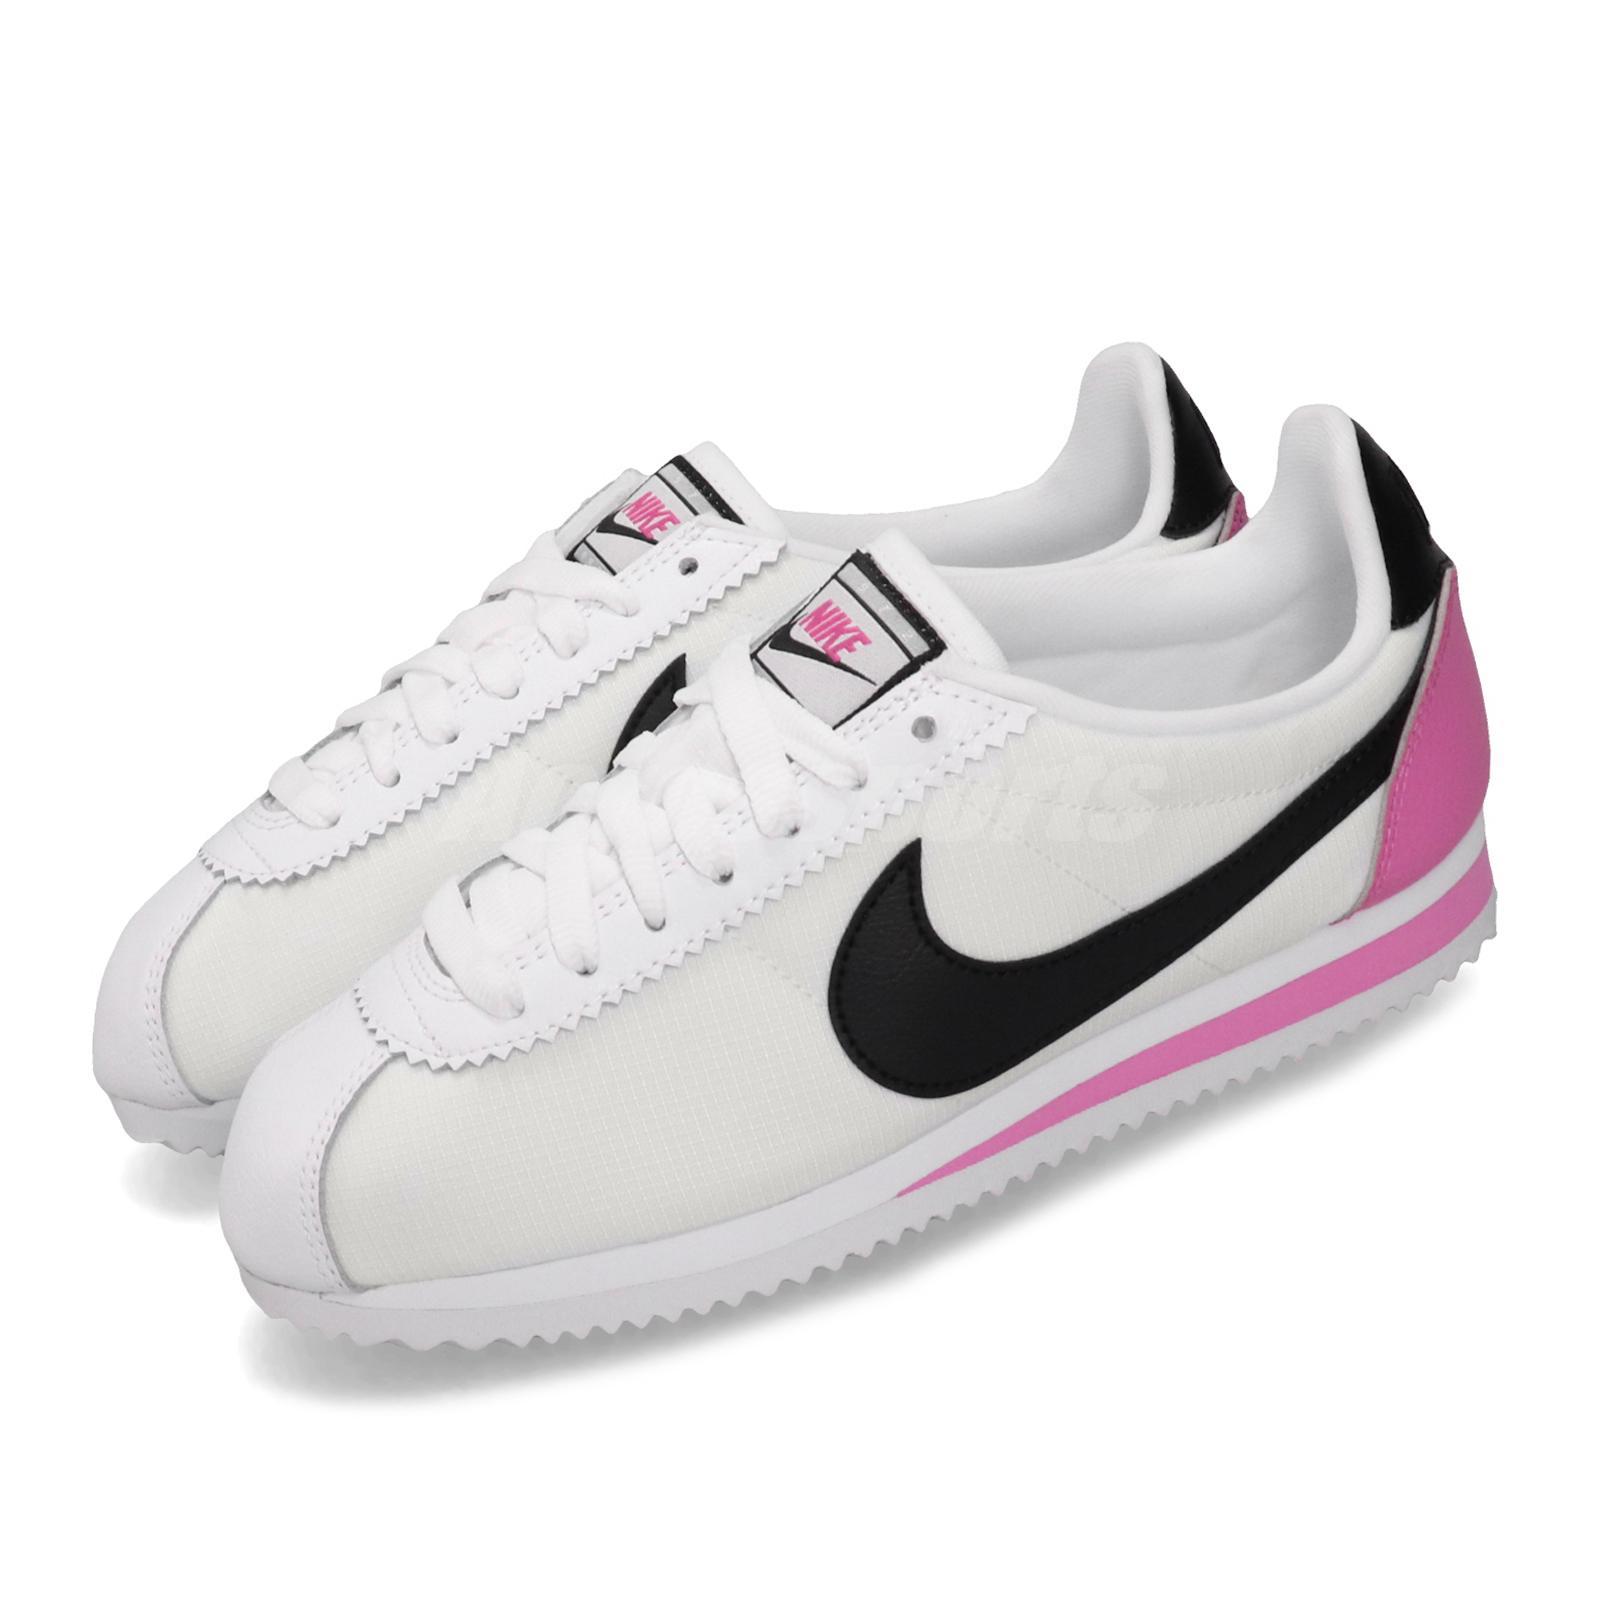 Infidelidad Tacón Arrugas  Nike Wmns Classic Cortez PREM White Black Rose Womens Running Shoes  905614-106 | eBay